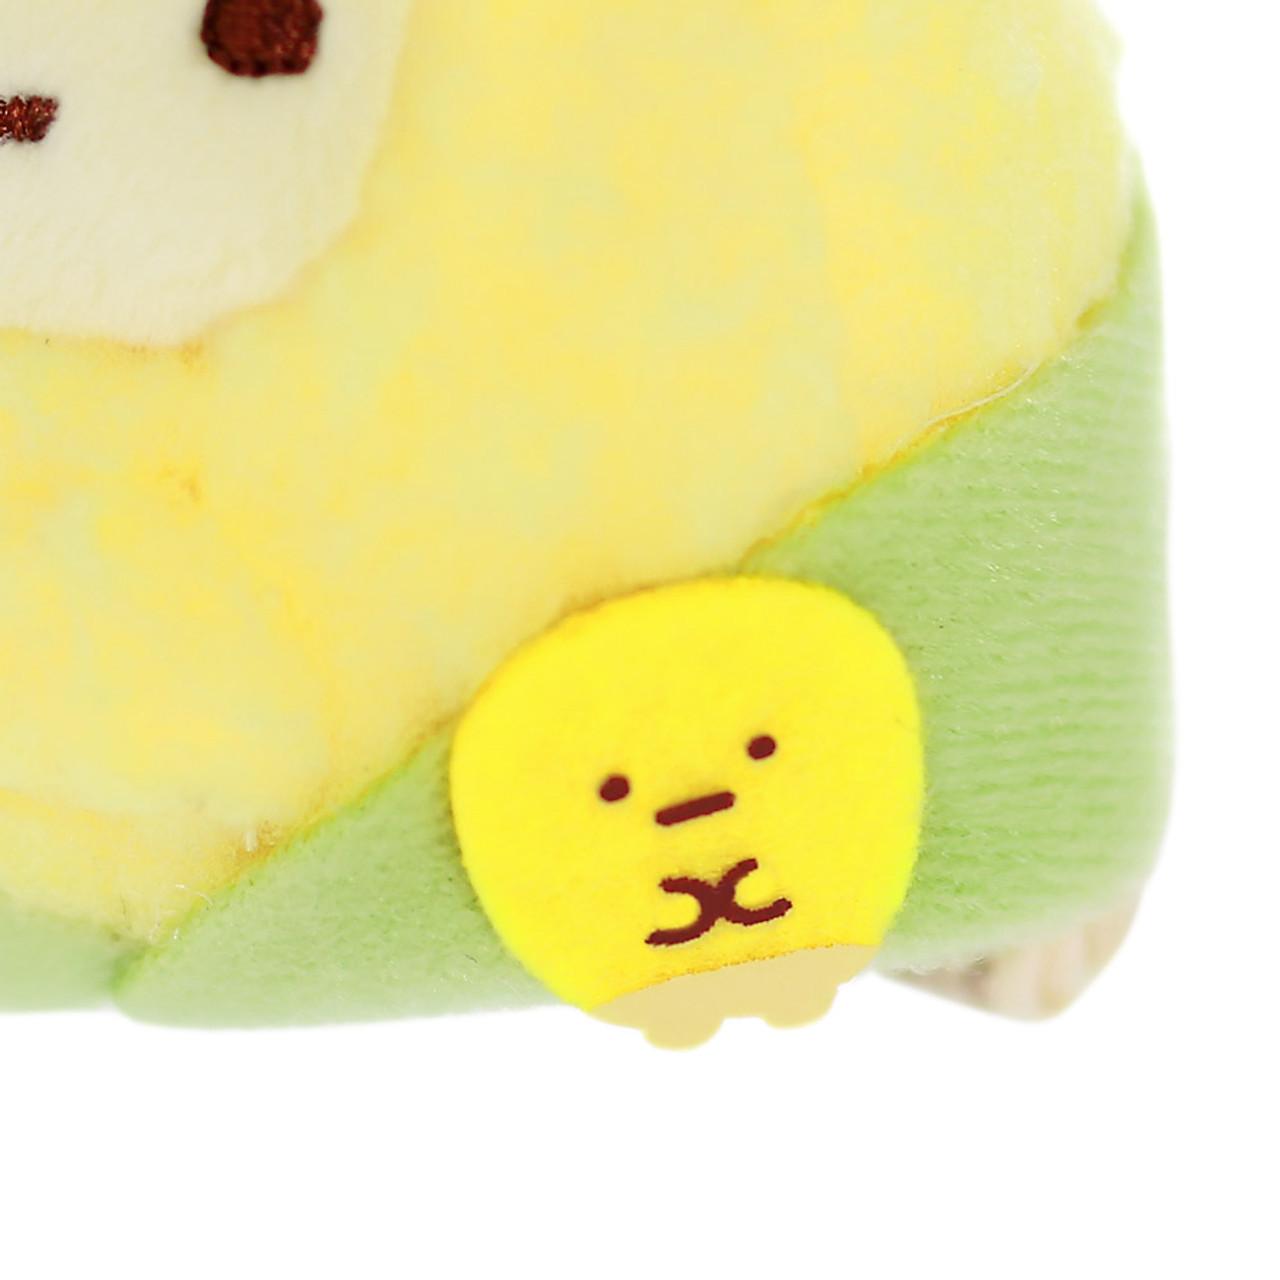 Sumikko Gurashi Tapioca Corn Palm Stuffed Toy ( Close-up )